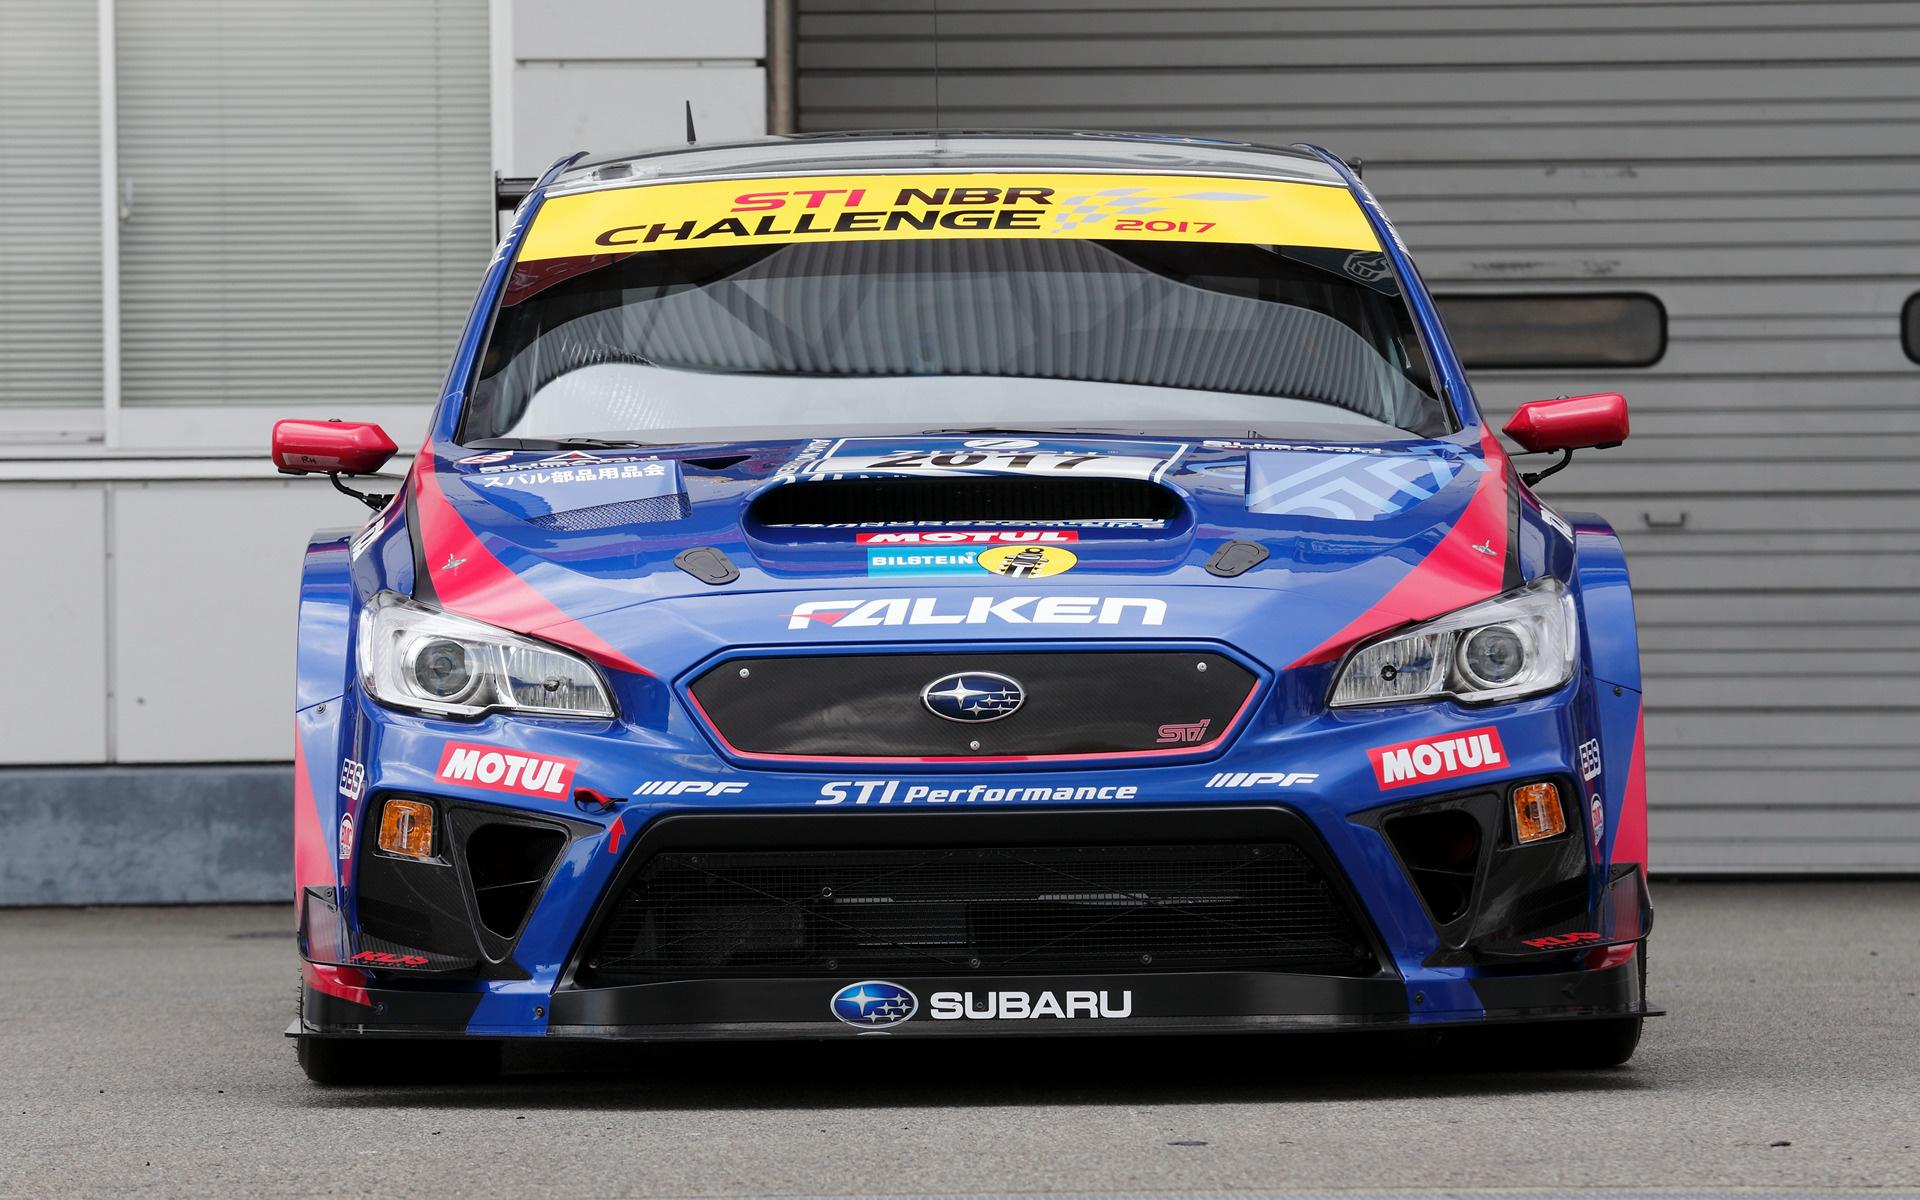 2017 Subaru Wrx Sti Race Car Wallpapers And Hd Images Car Pixel